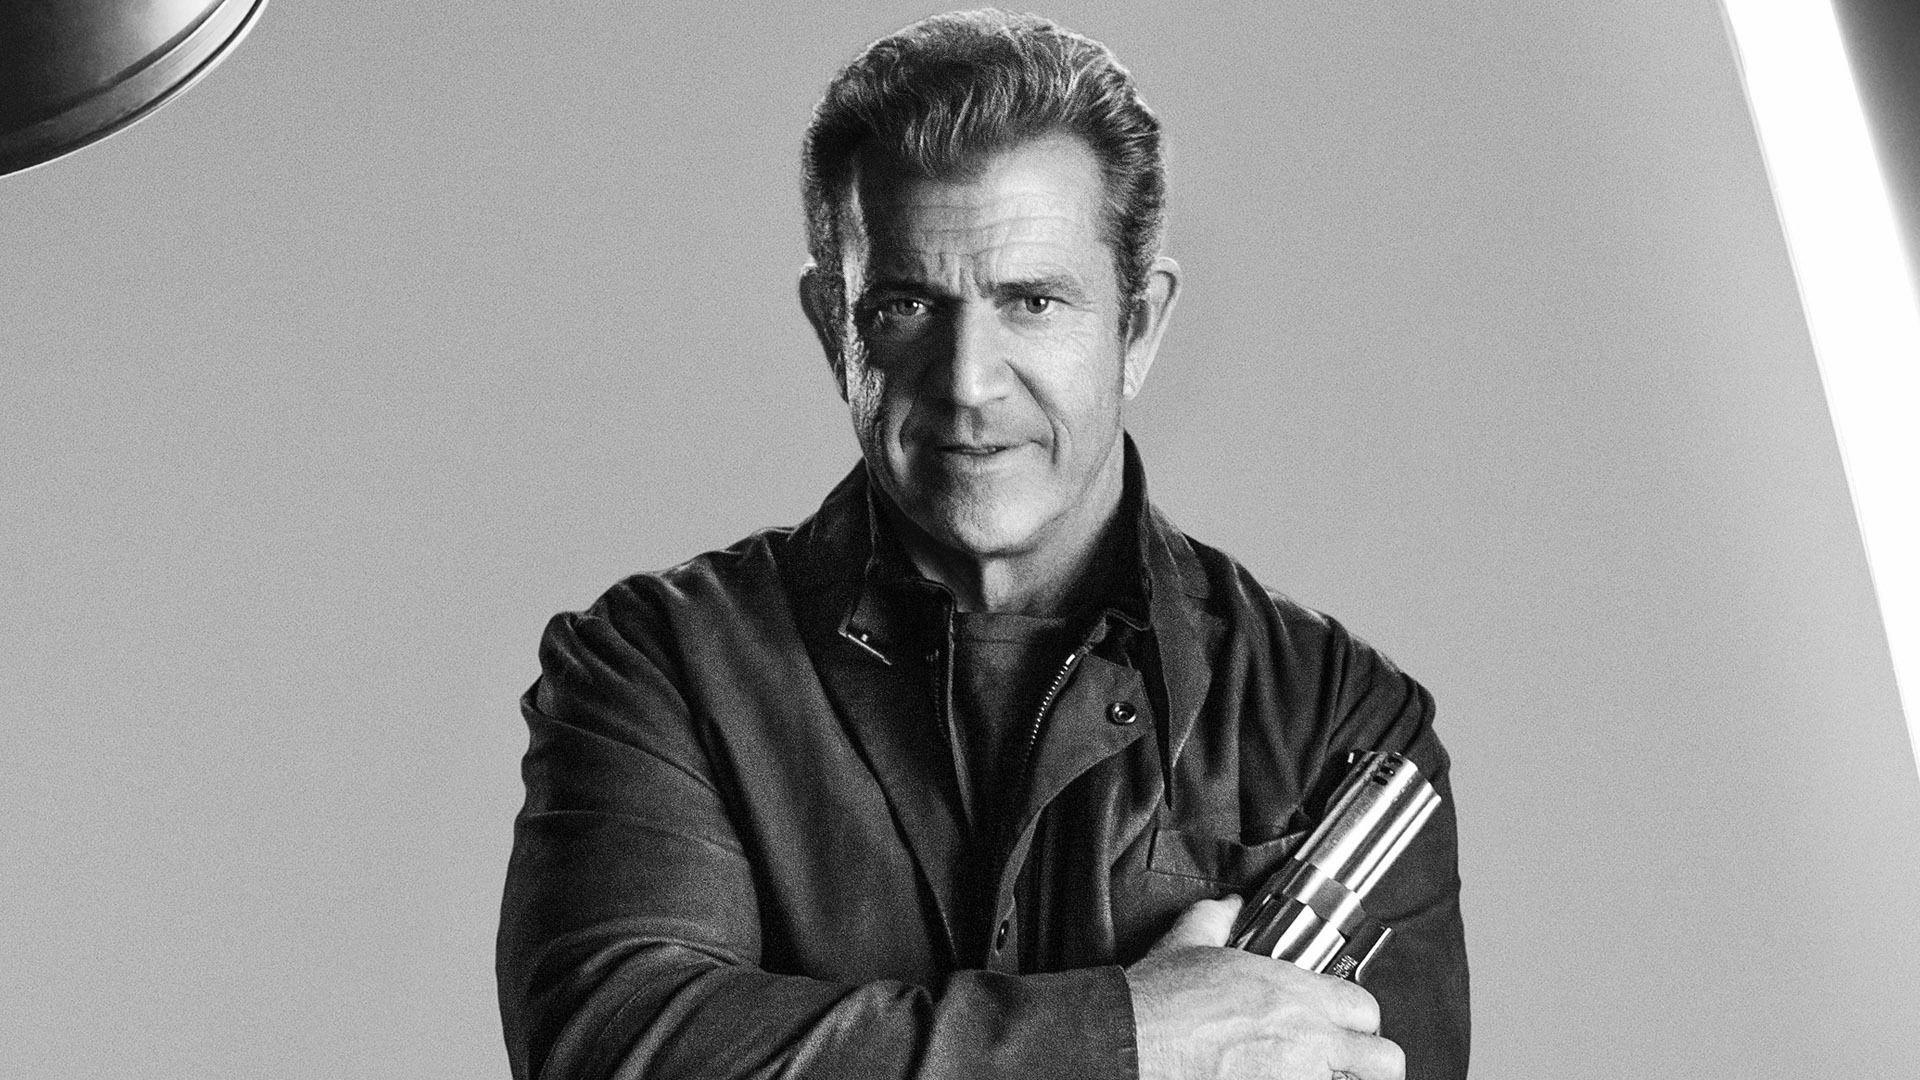 Mel Gibson Wallpaper 1   1920 X 1080 stmednet 1920x1080